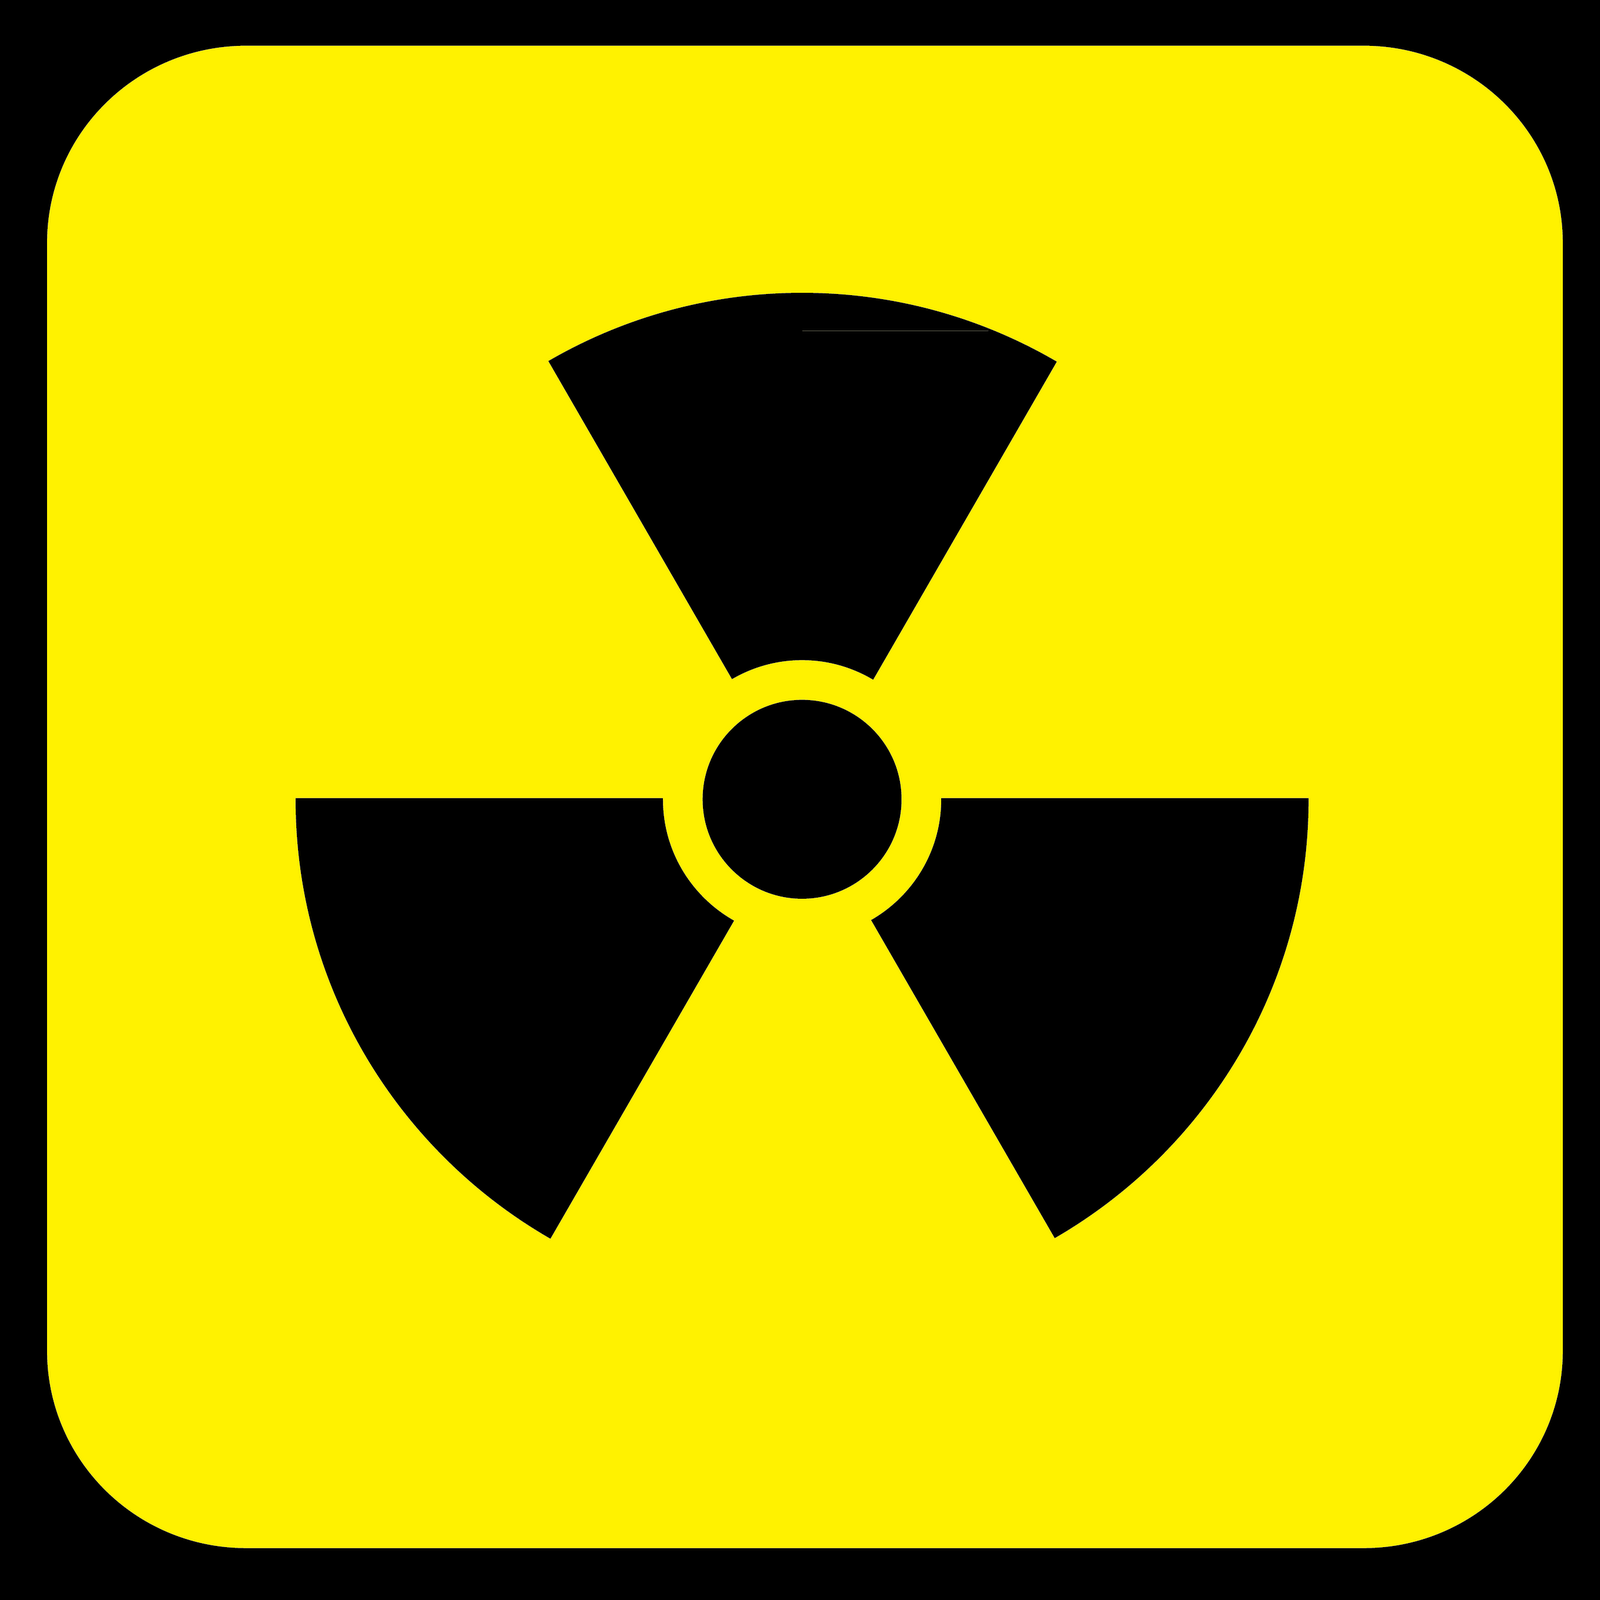 Nuclear clipart logo #6